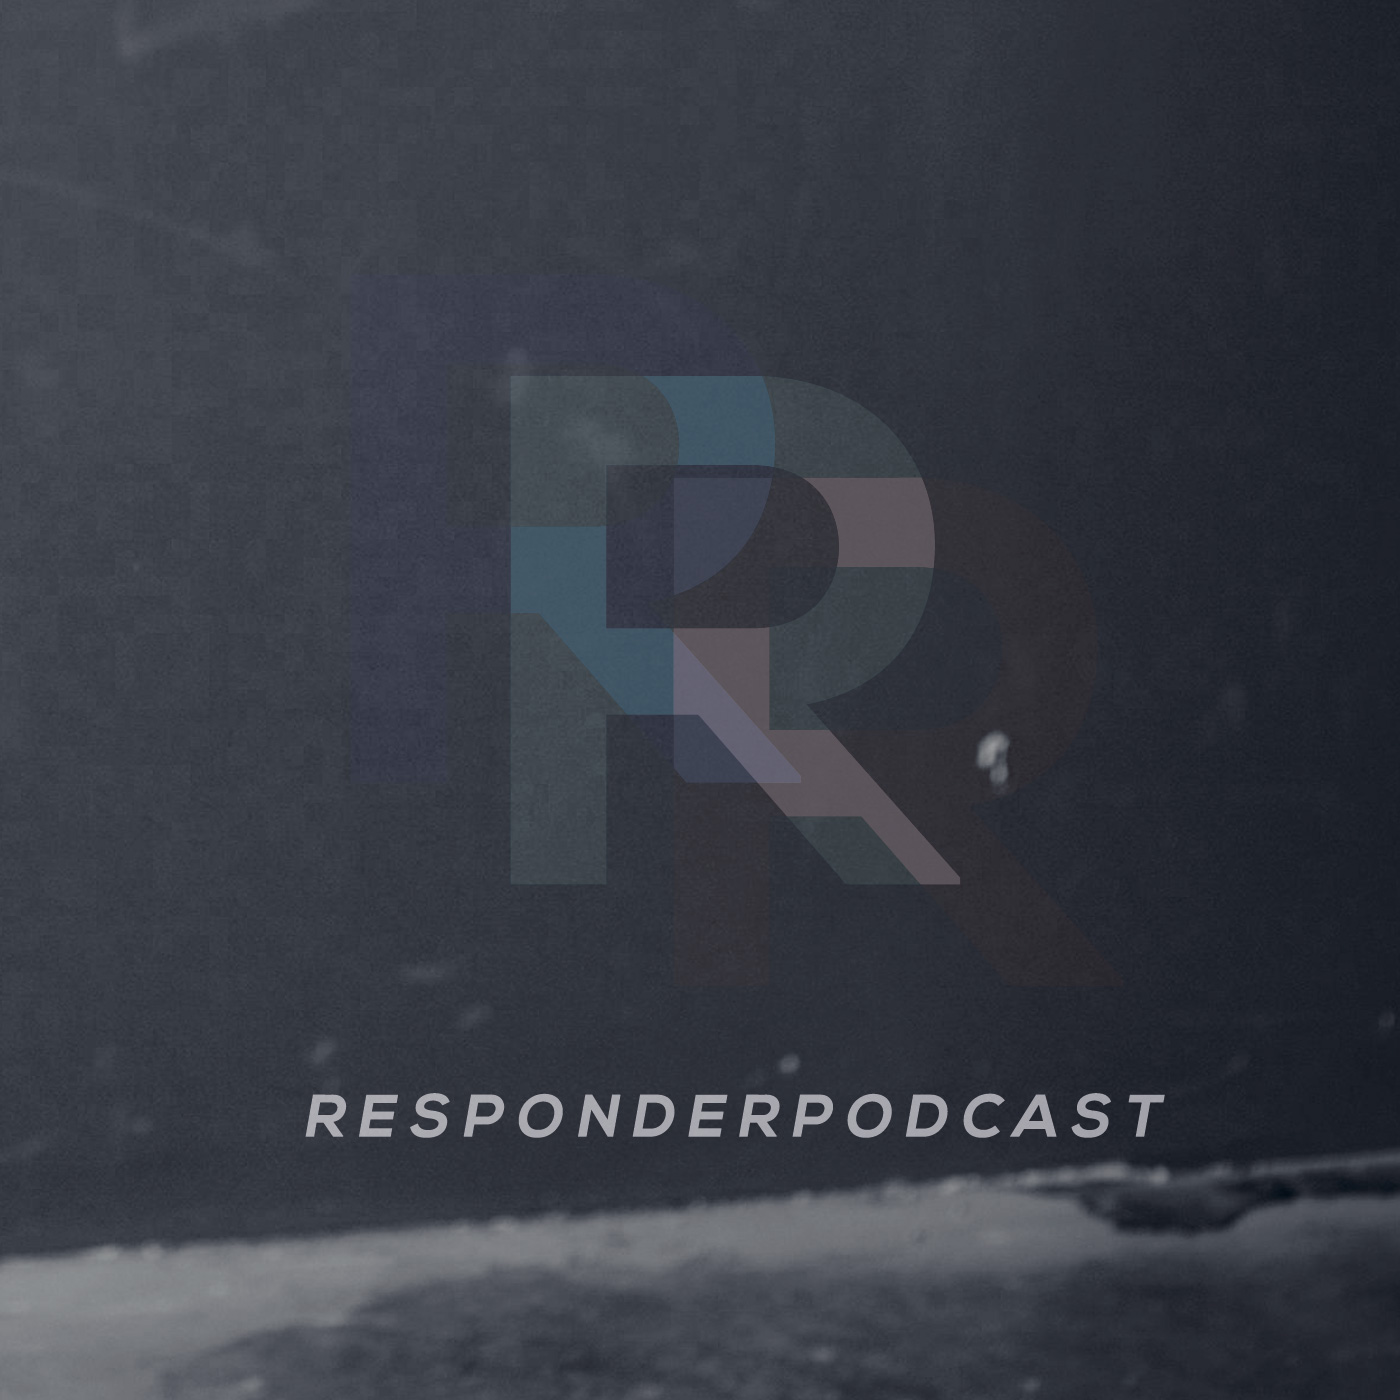 Responder Podcast